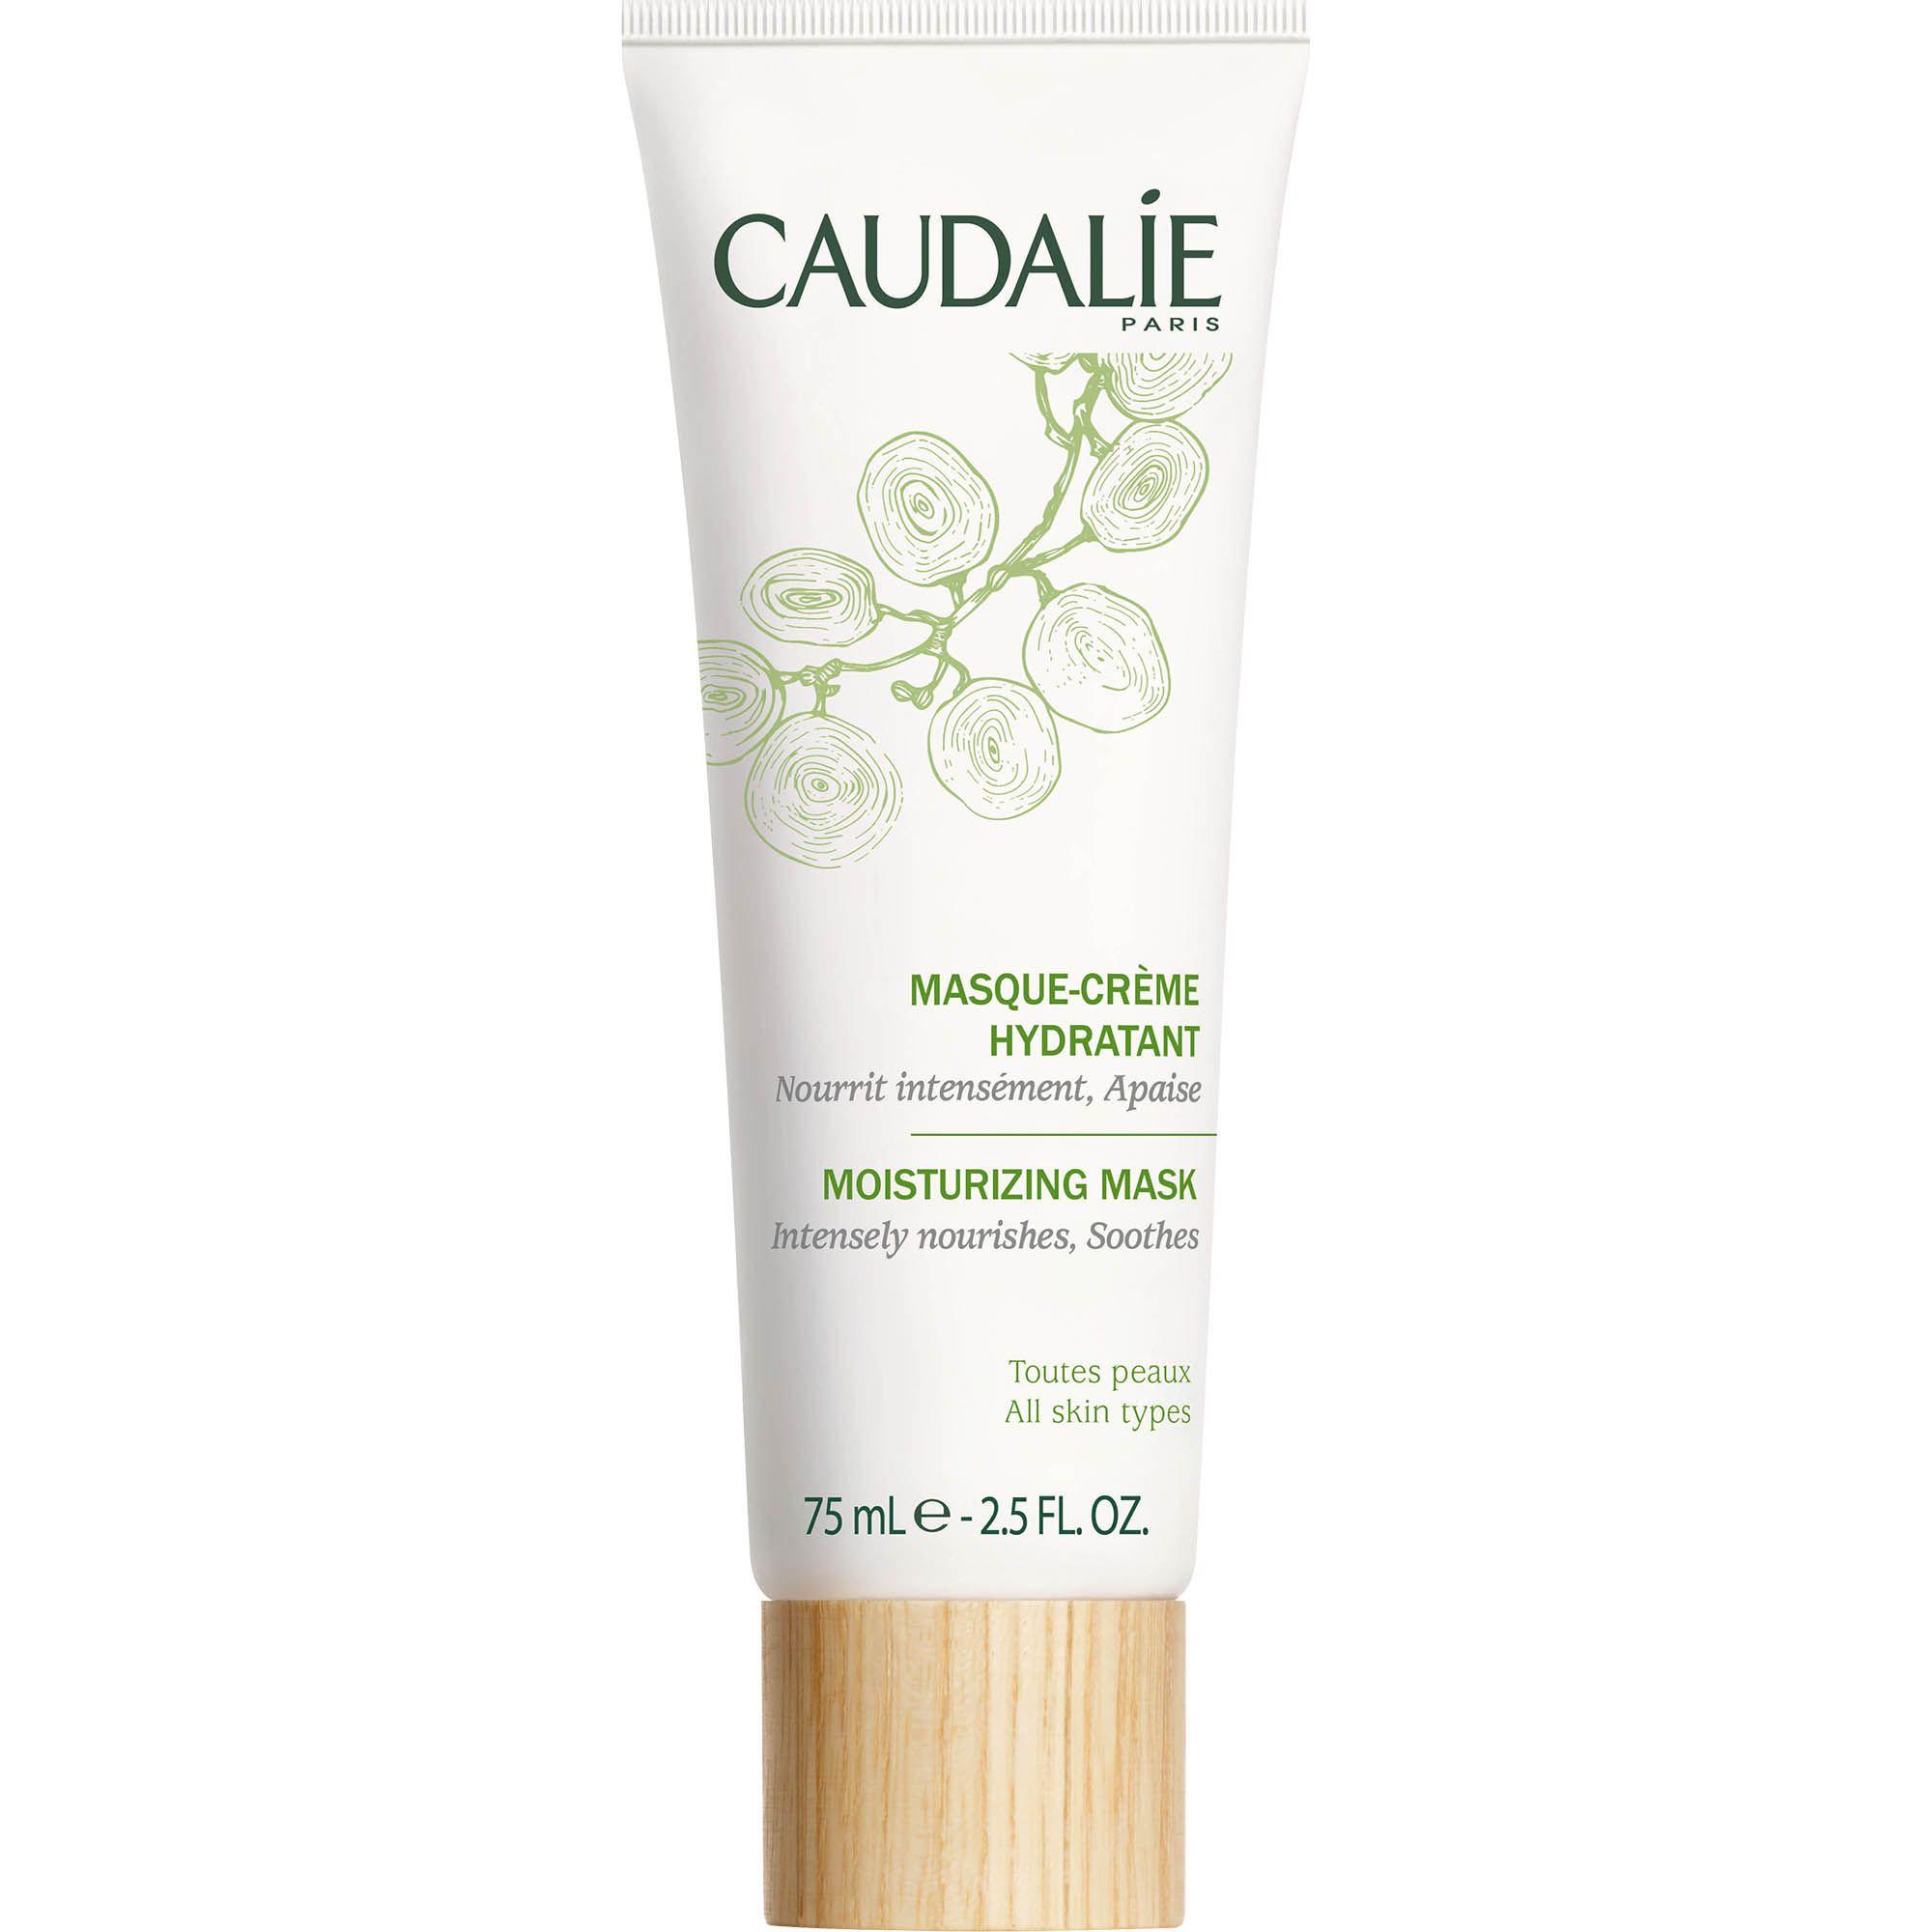 Blissim : Caudalie - Masque Crème Hydratant - Masque Crème Hydratant